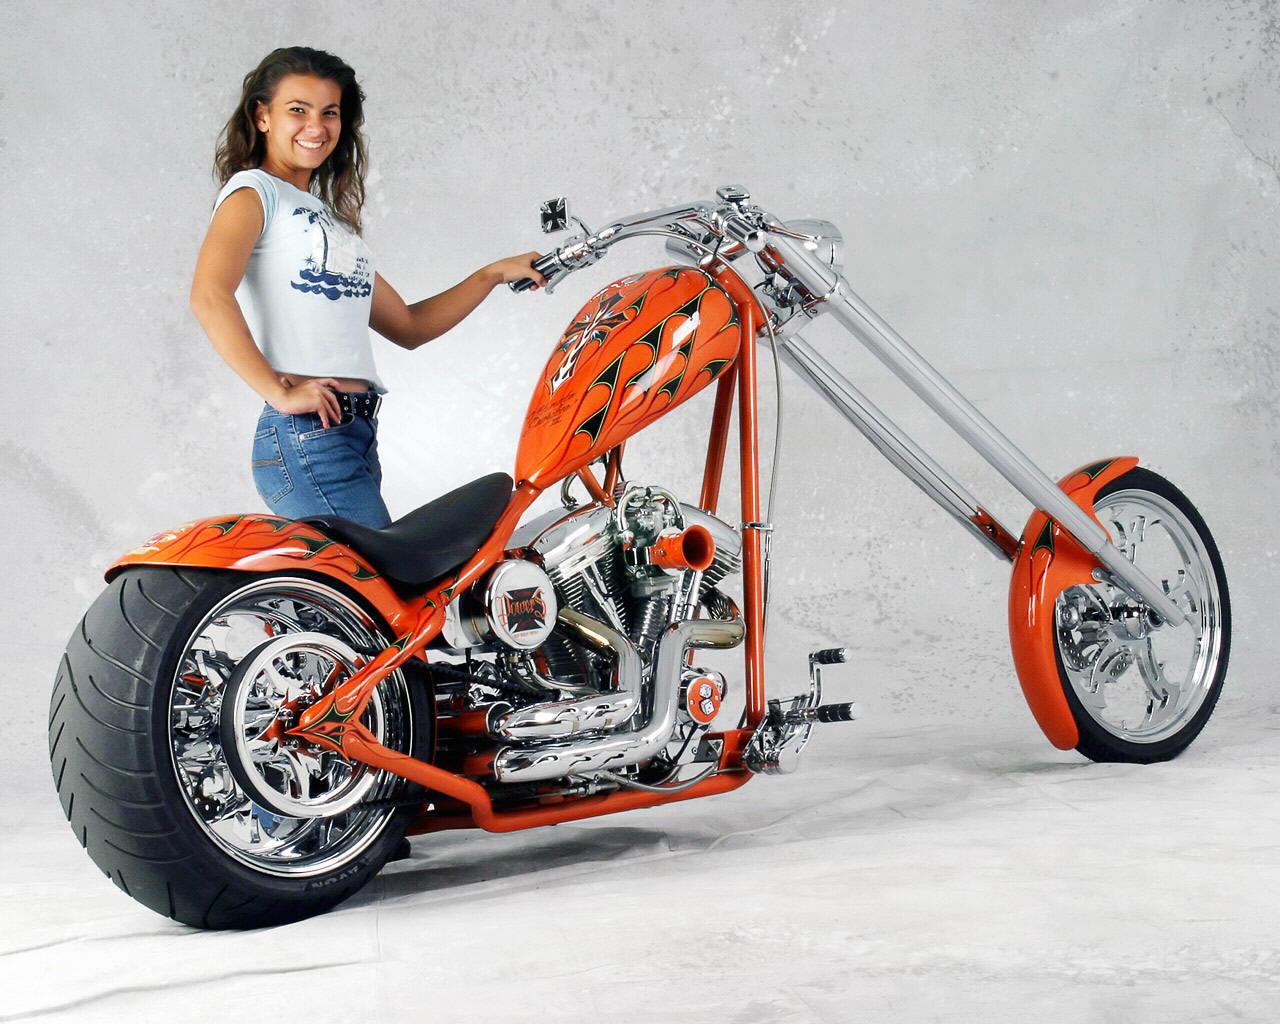 http://3.bp.blogspot.com/_TcwbPuj2SZ0/TNcPVibPkUI/AAAAAAAATfo/LrKCDveyLZ0/s1600/300%27%27-Pro-Street-Chopper-Wallpaper.jpg